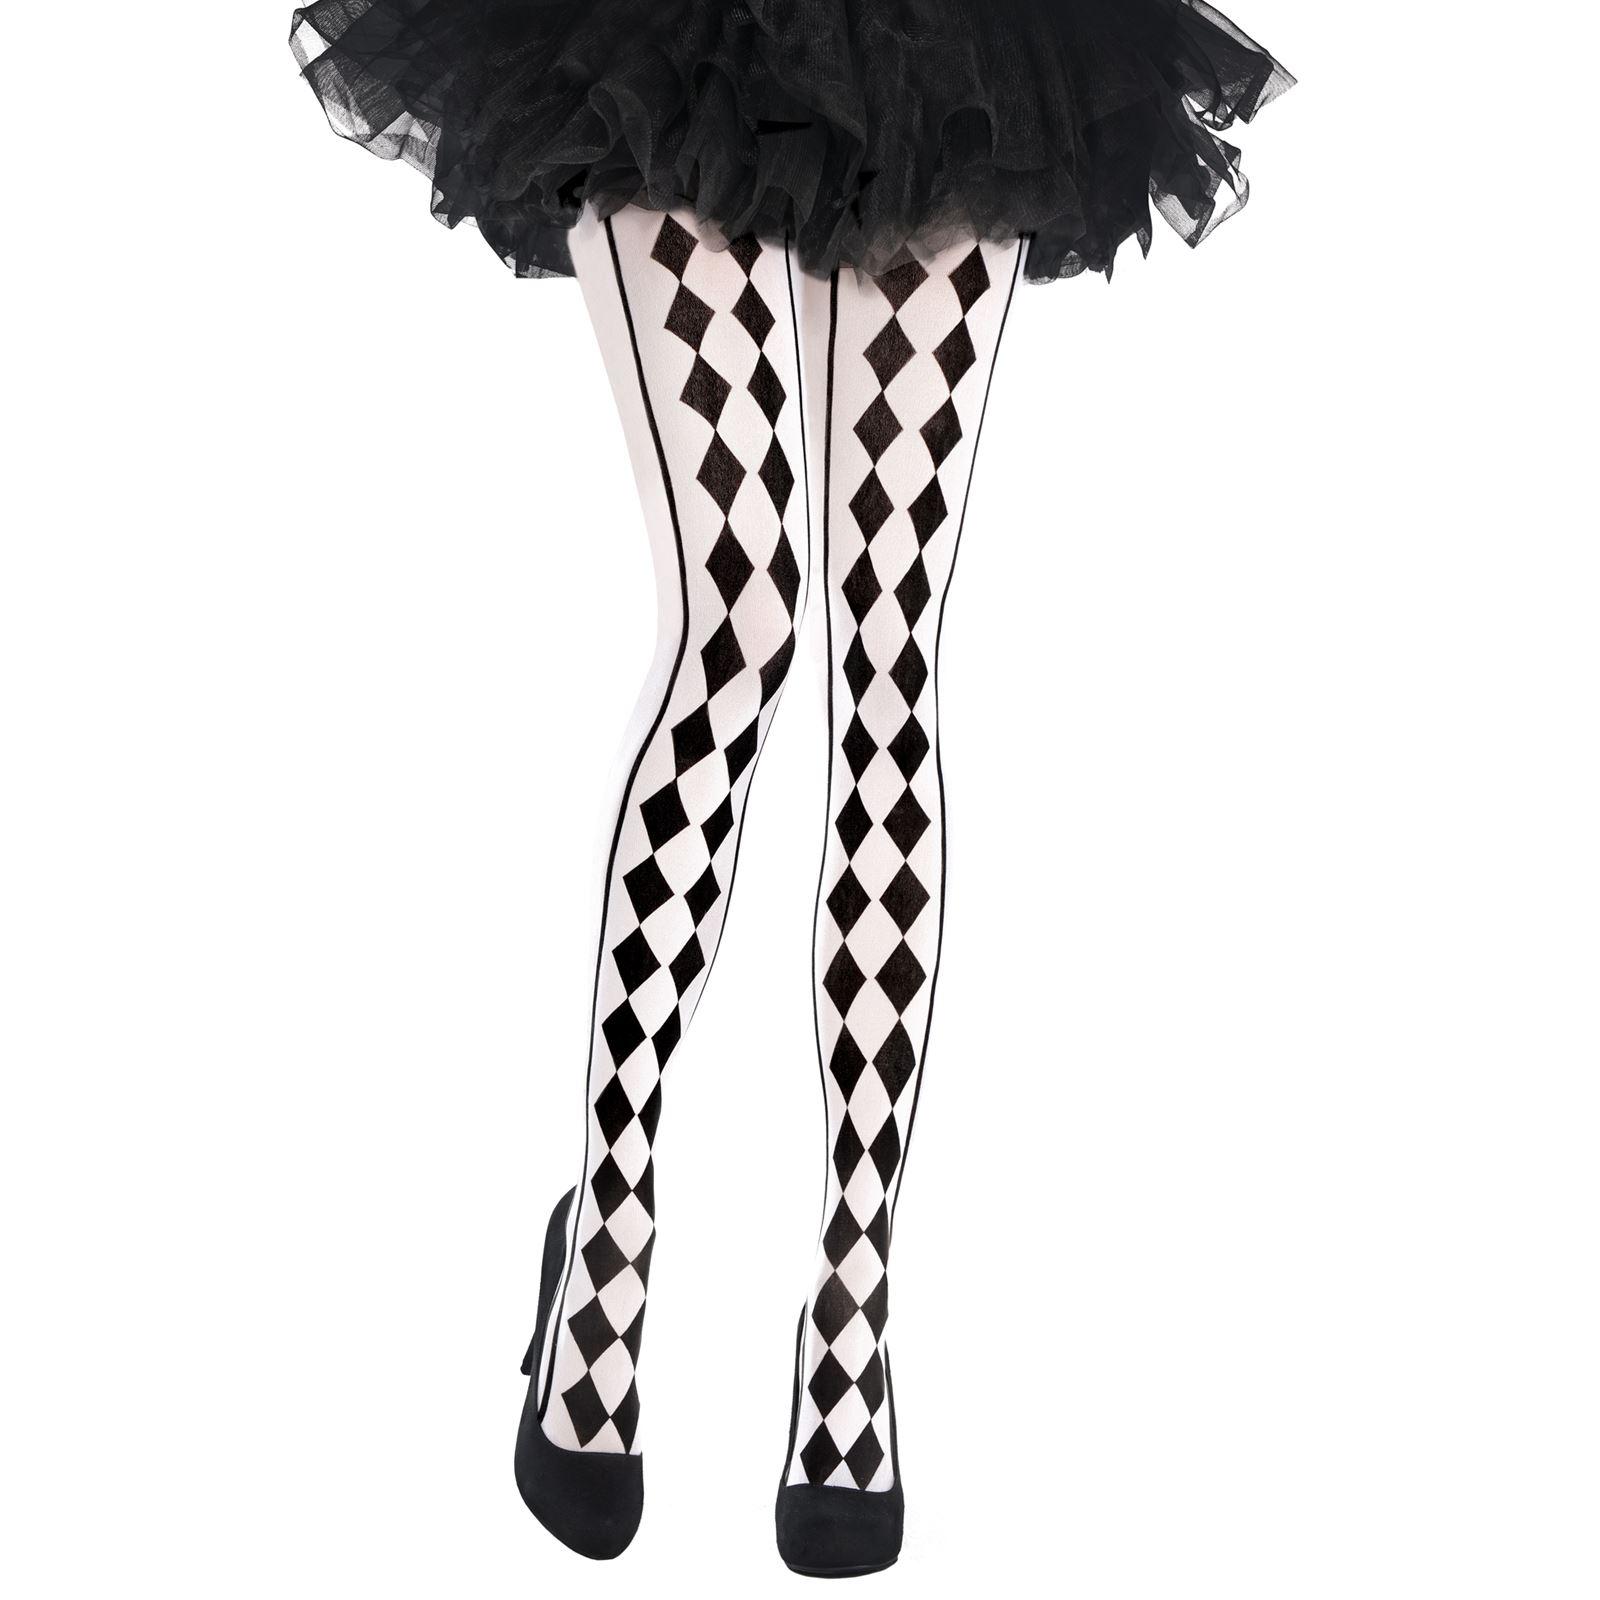 2 Colour Leg Tights Pantyhose Jester Clown Harley Quinn Fancy Dress Black White